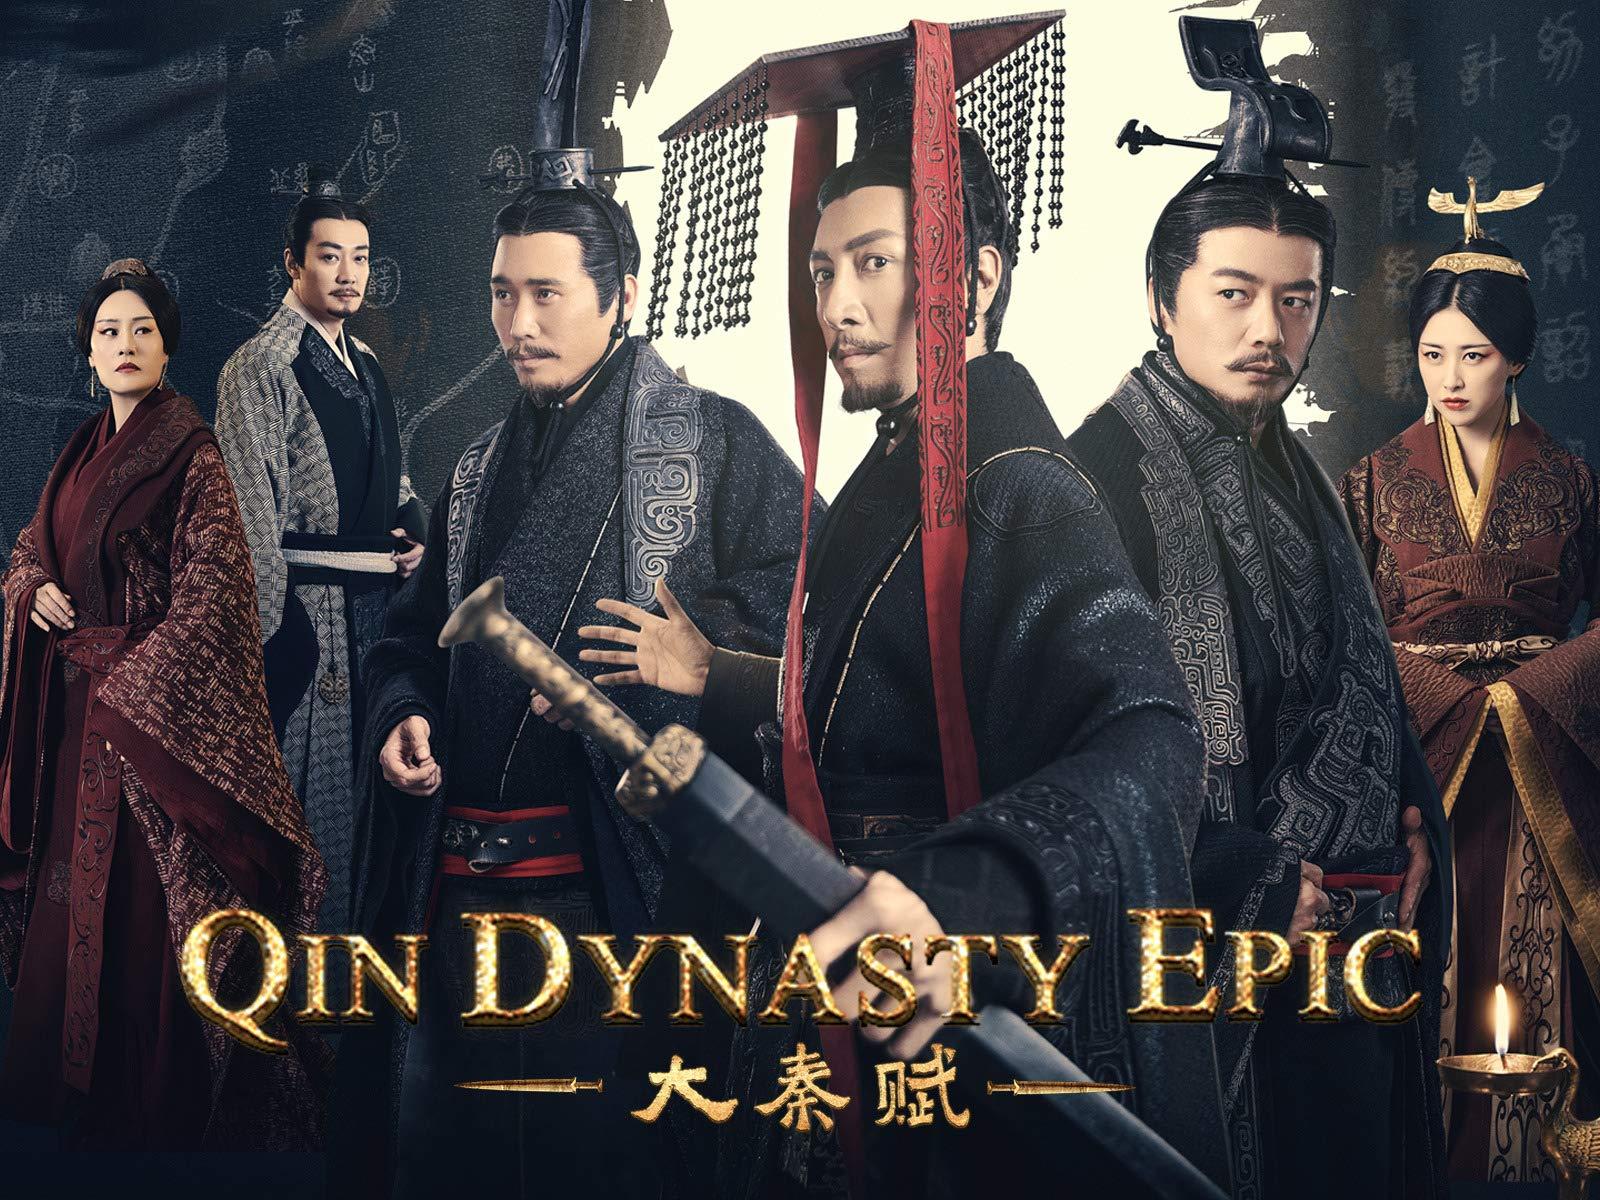 Qin Dynasty Epic on Amazon Prime Video UK